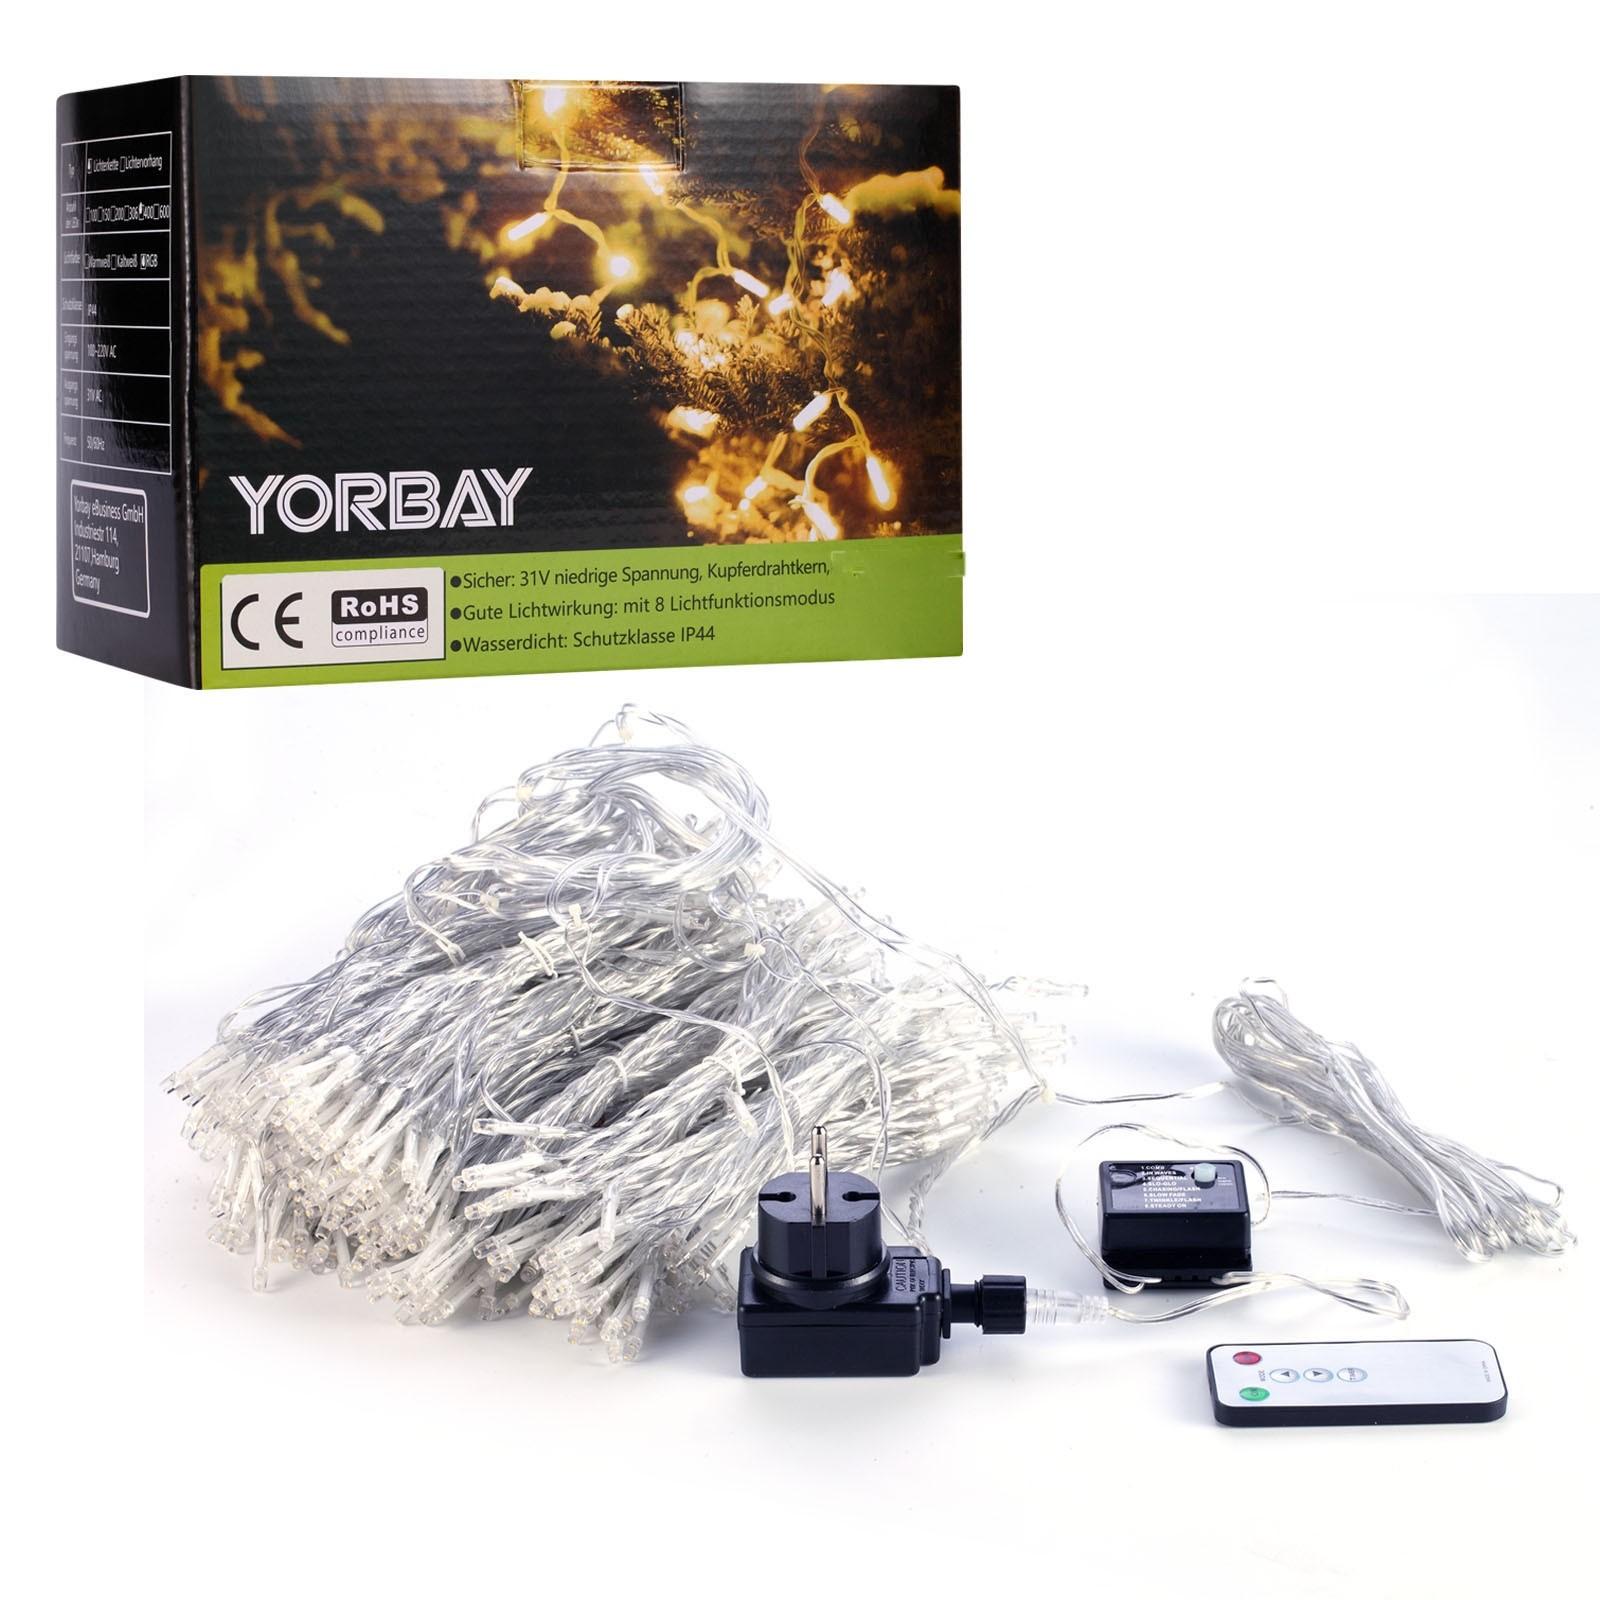 lichterkettenvorhang-yorbay-06